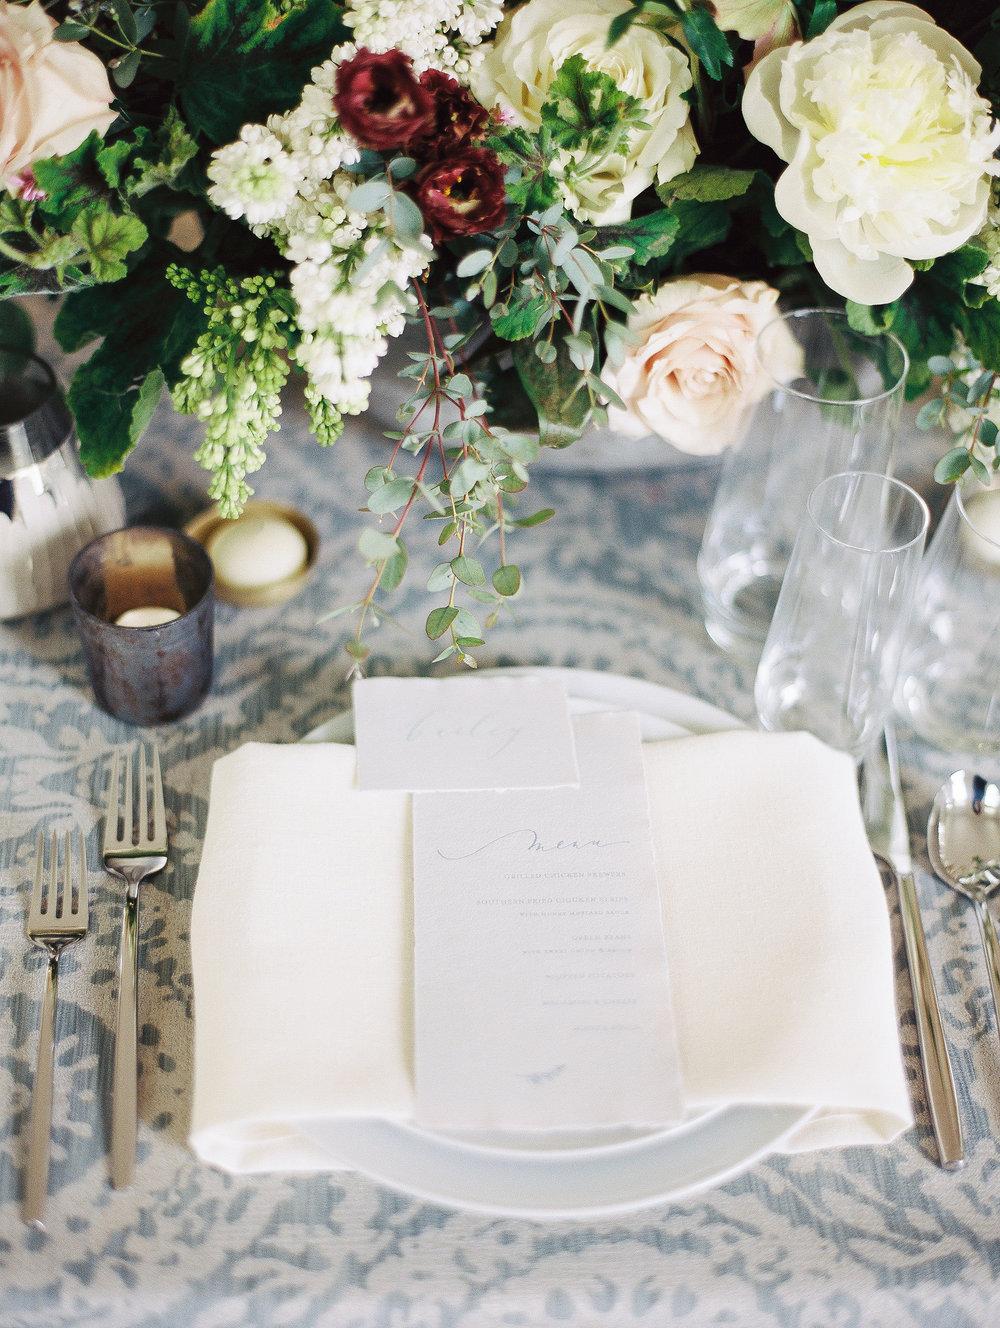 jessica-zimmerman-southern-wedding-head-table-place-setting.jpg